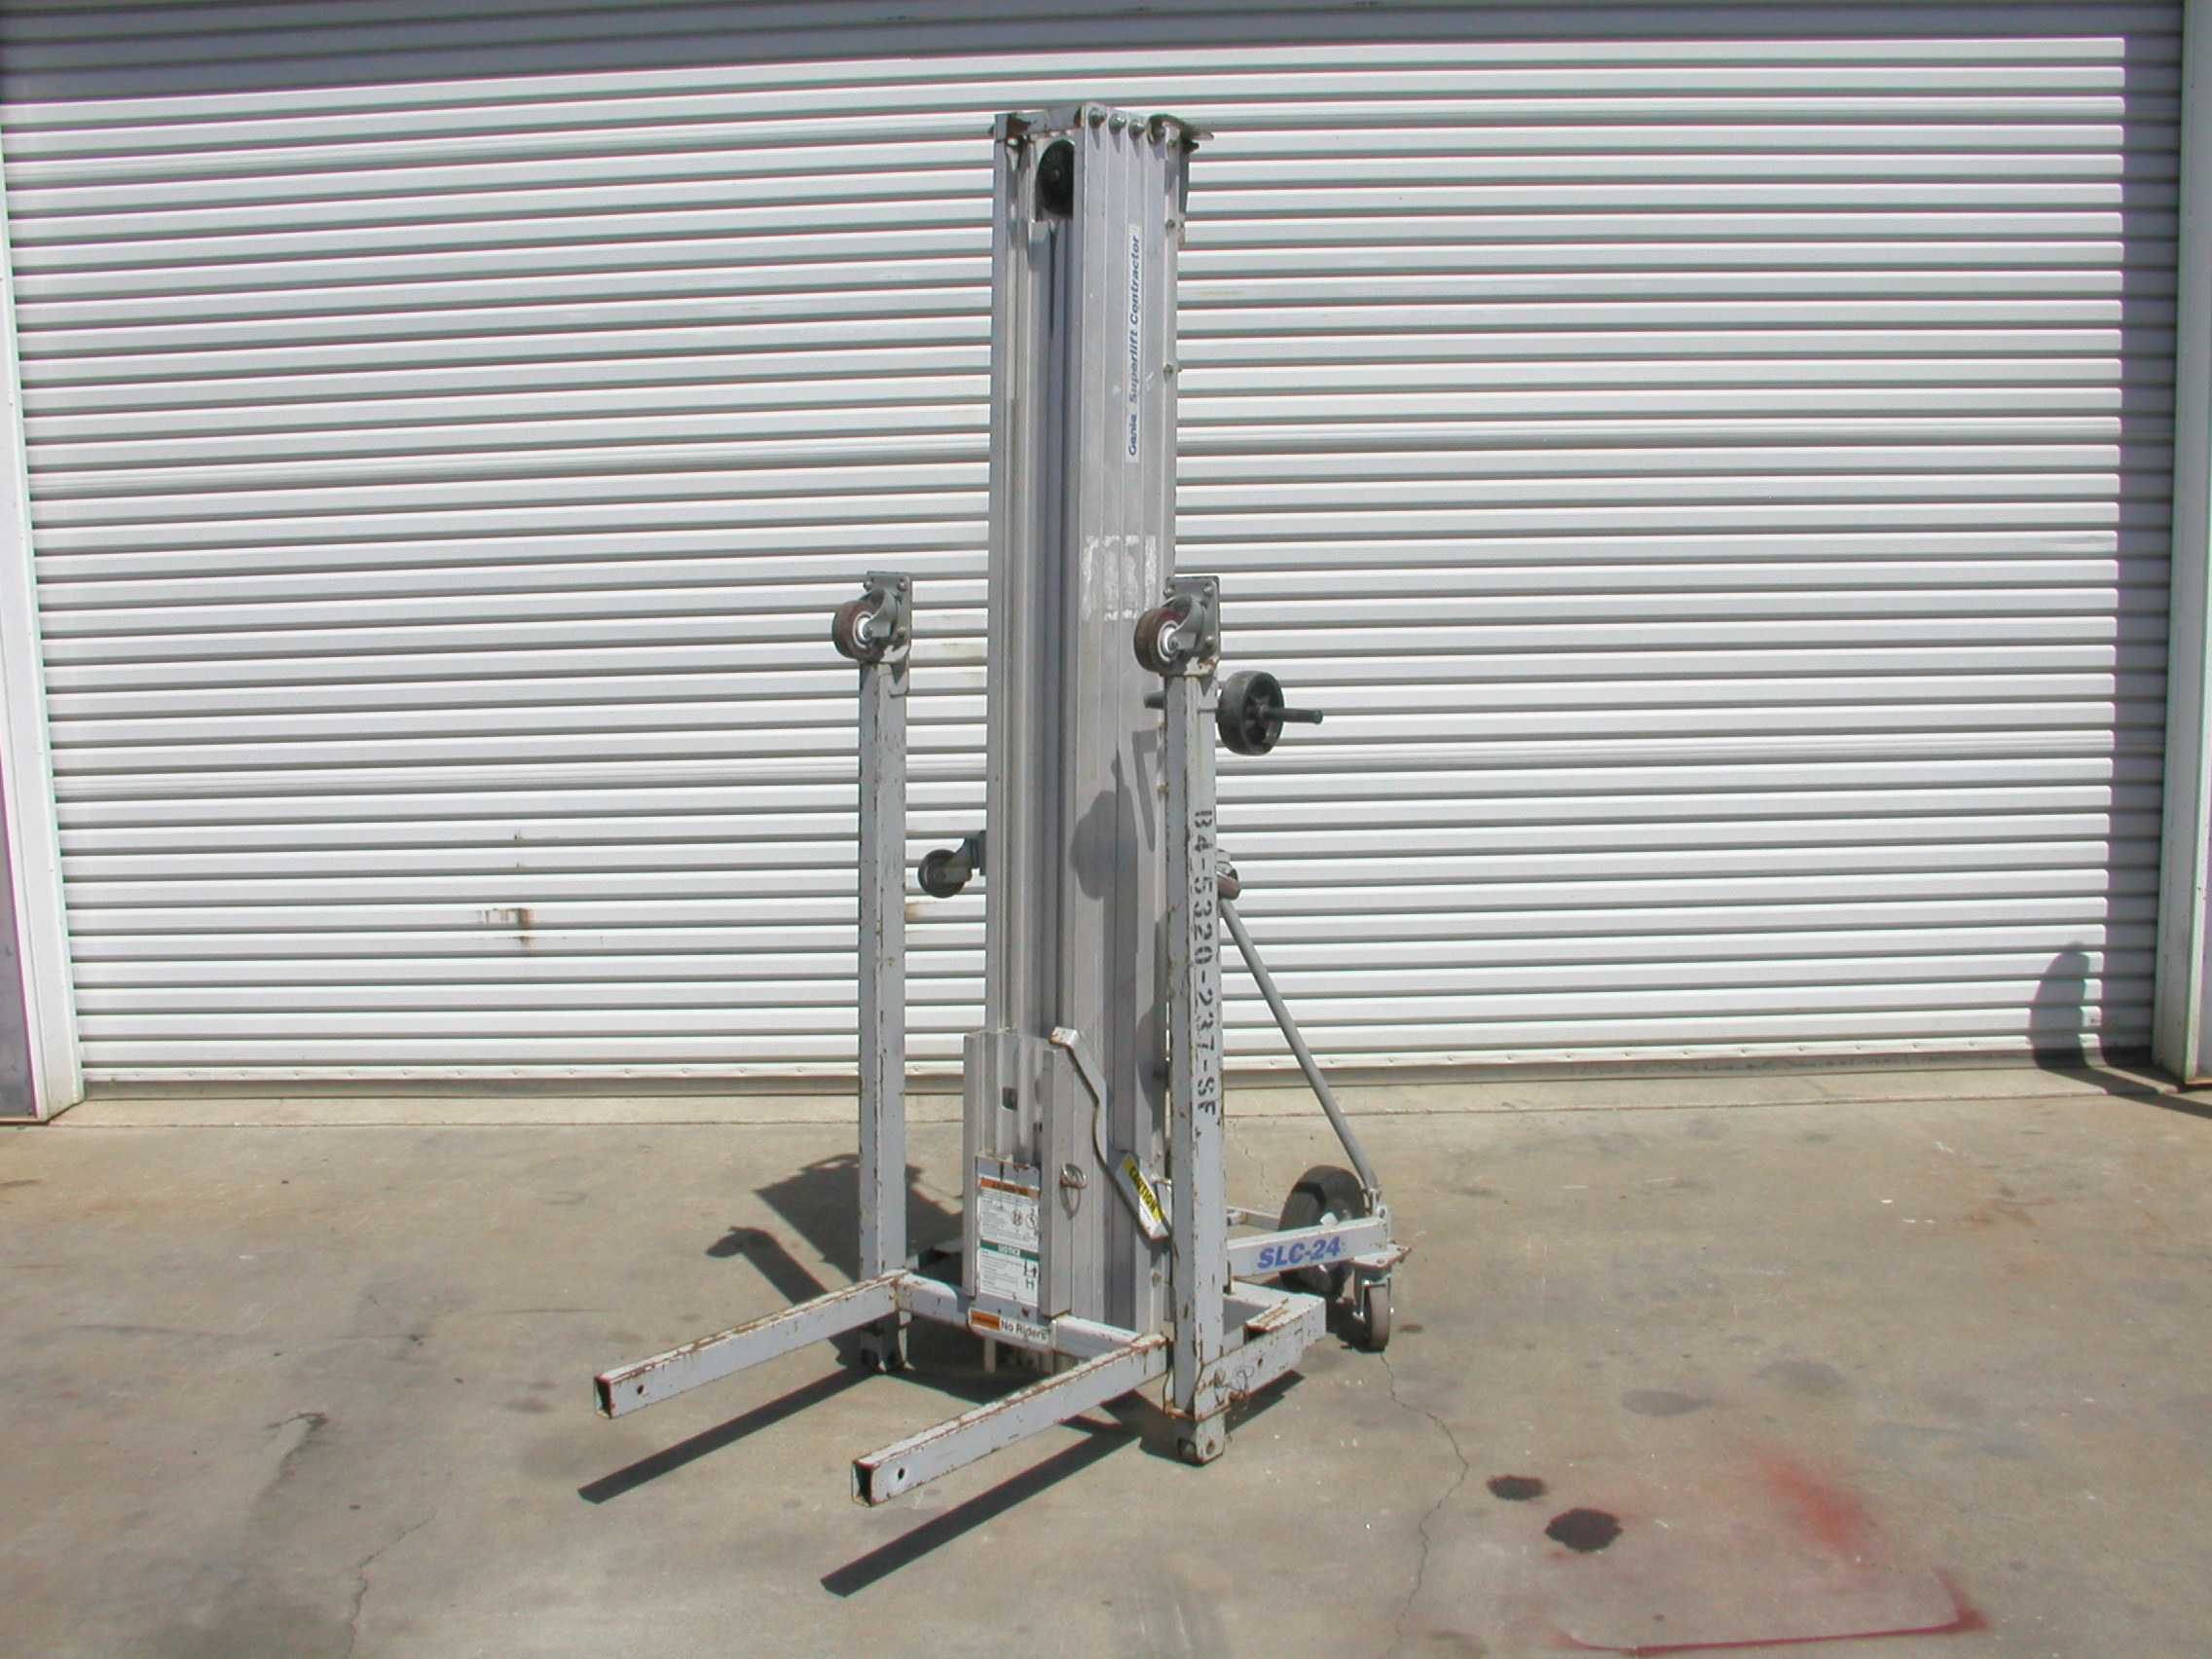 Genie Lift SLC-24